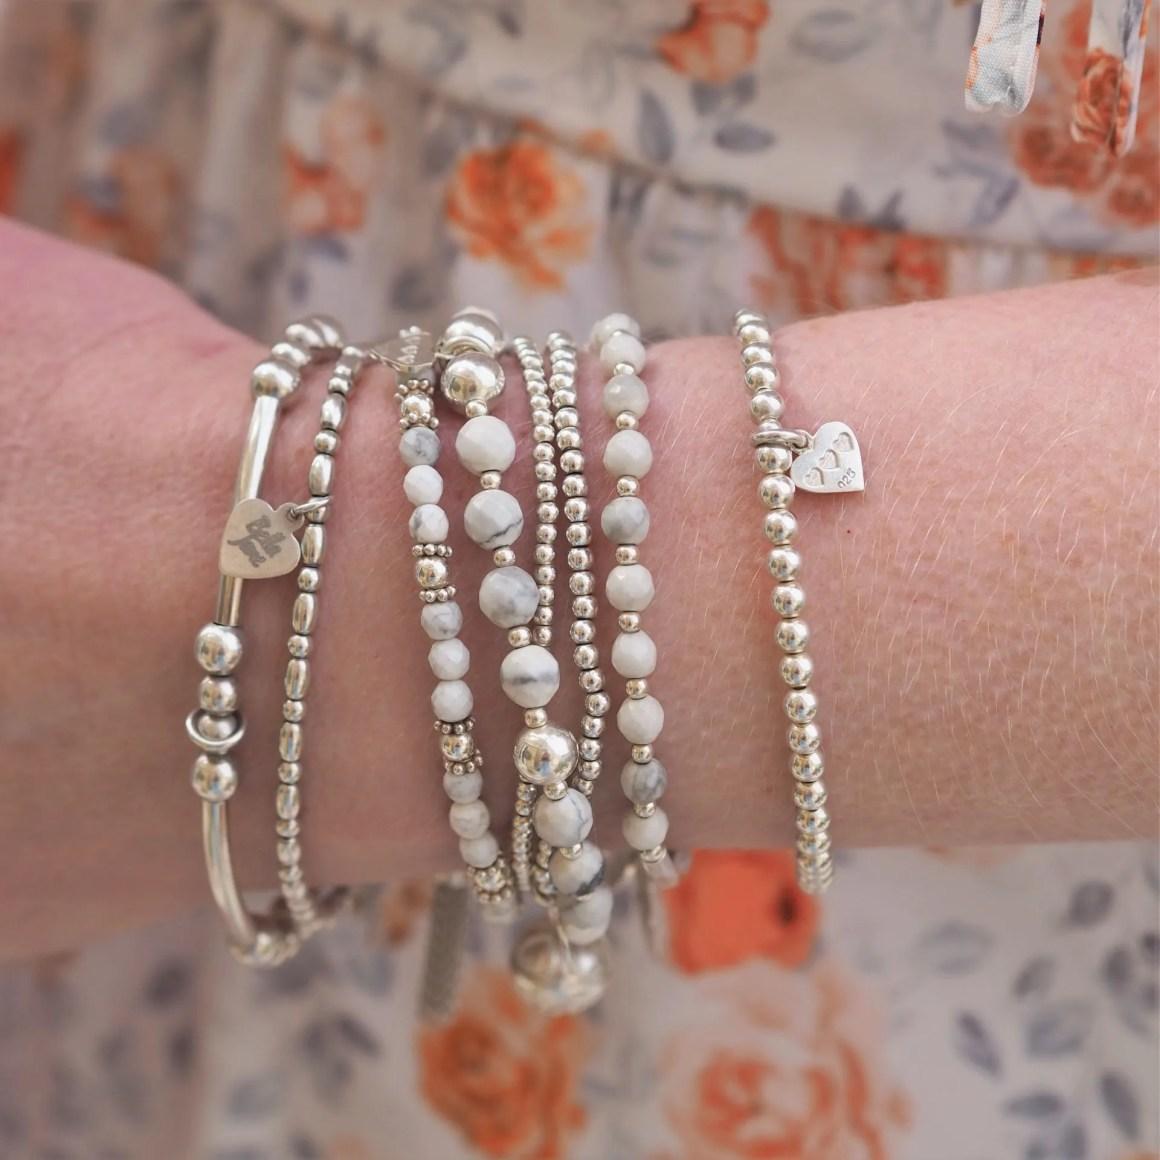 silver stacking bracelets